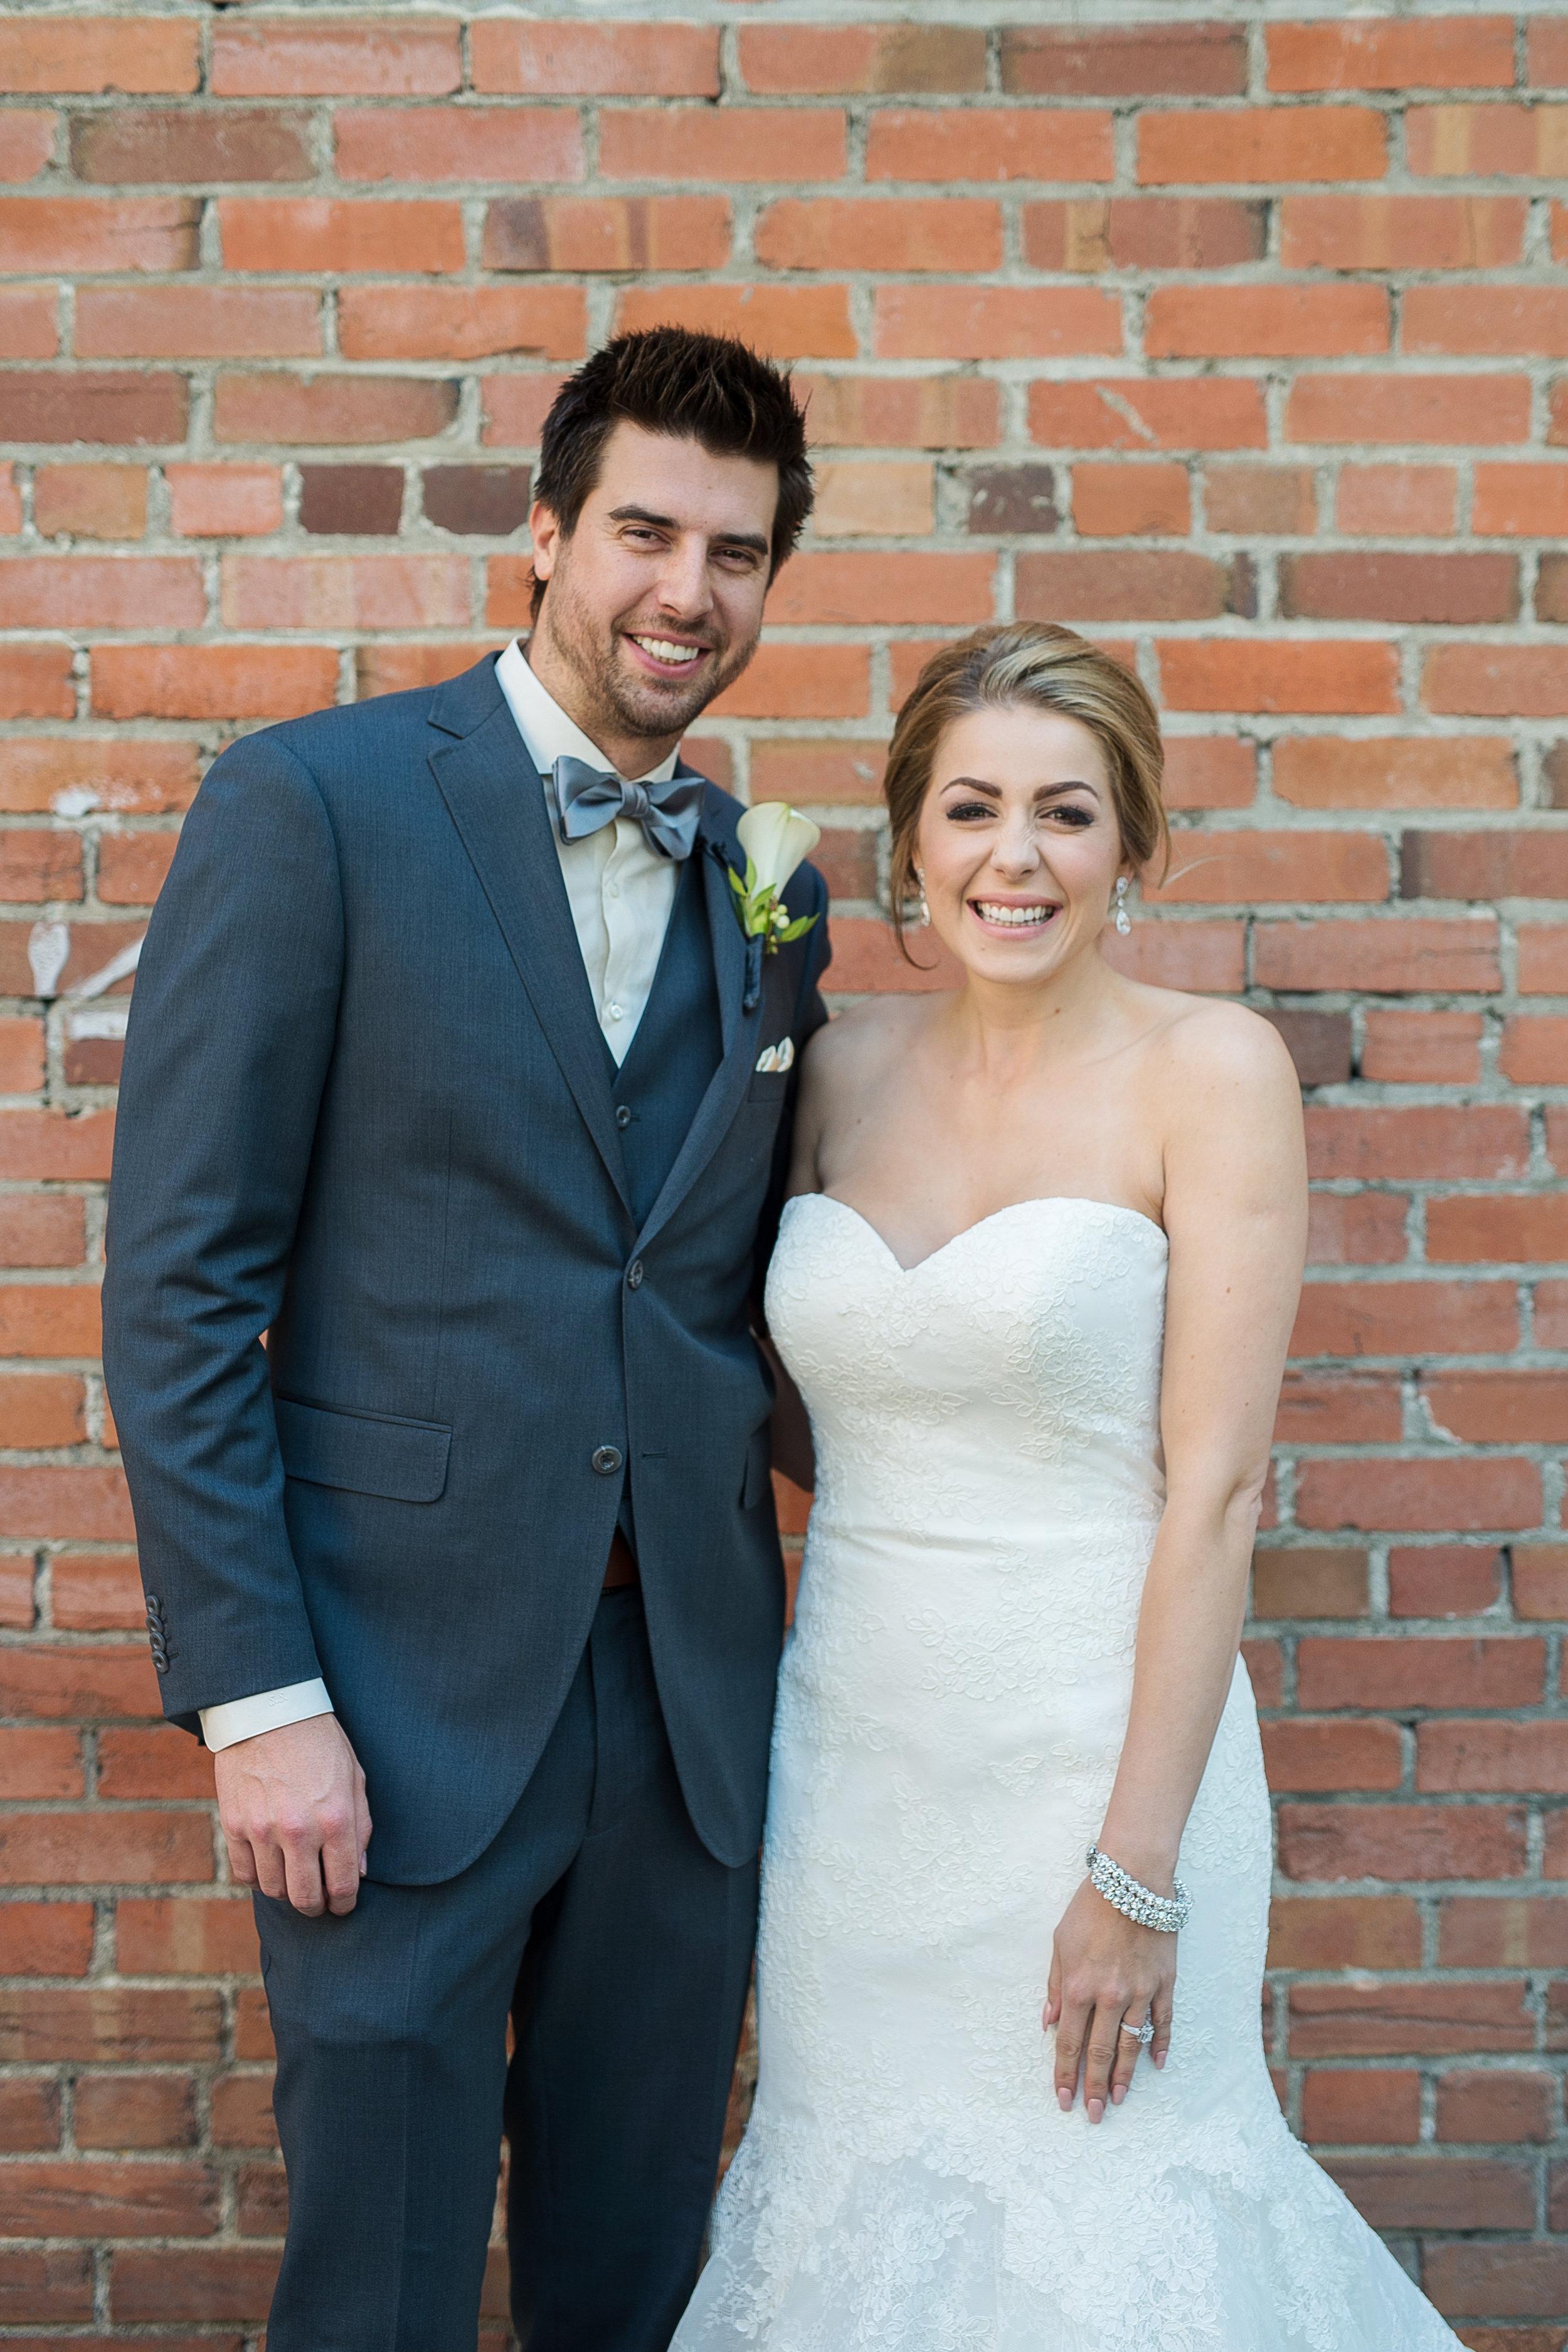 Calgary_Wedding_Photographer_Sanja_Scott_2016_HR 0217.jpg